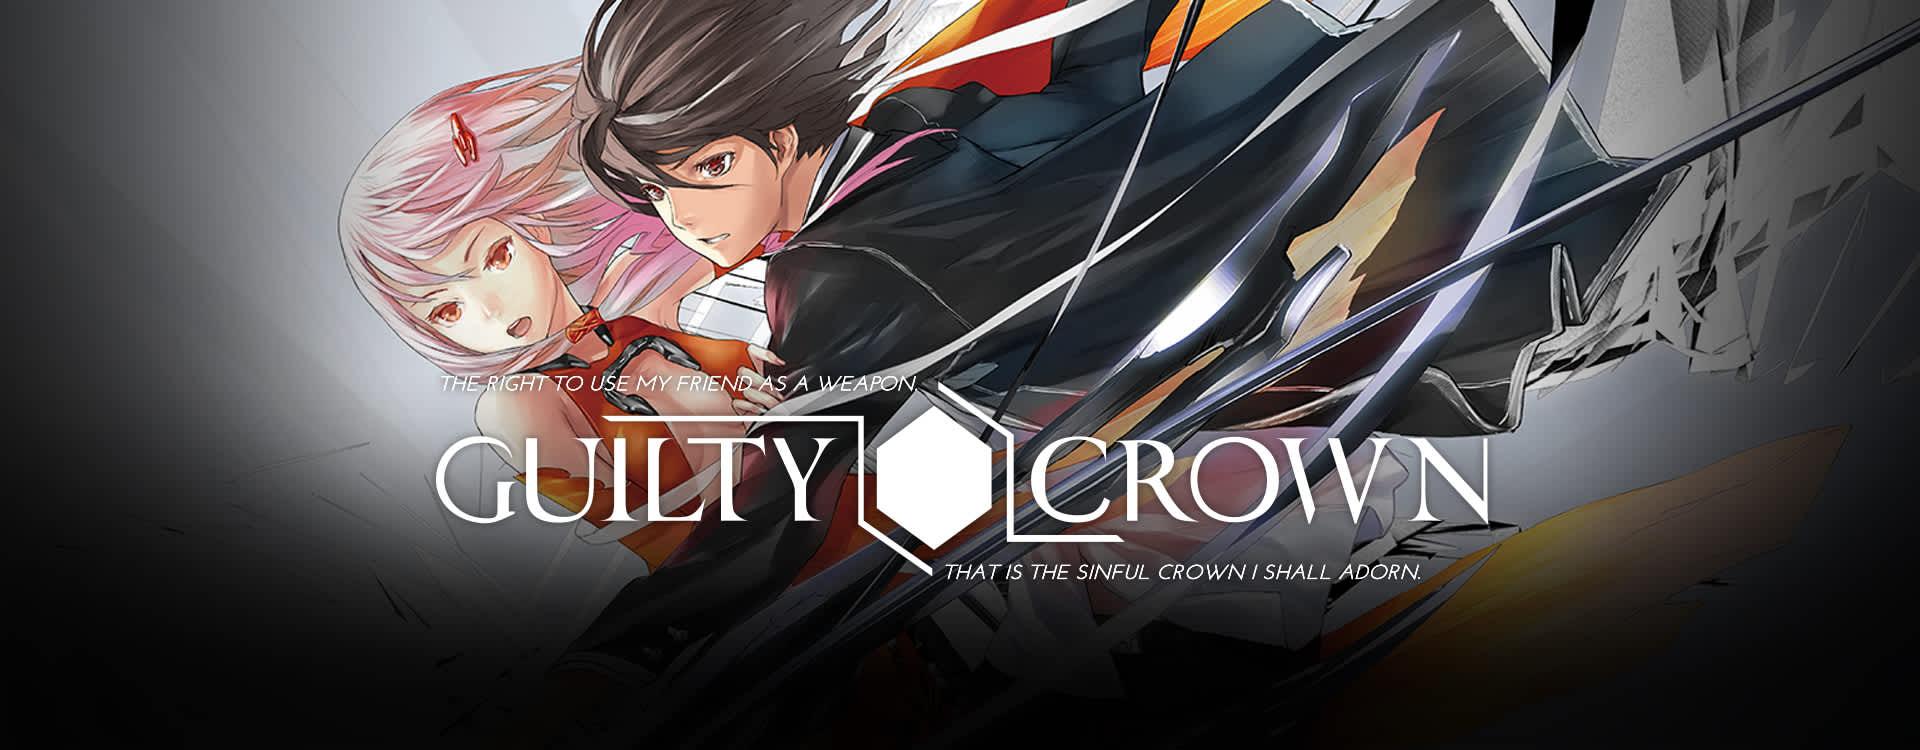 serien stream guilty crown